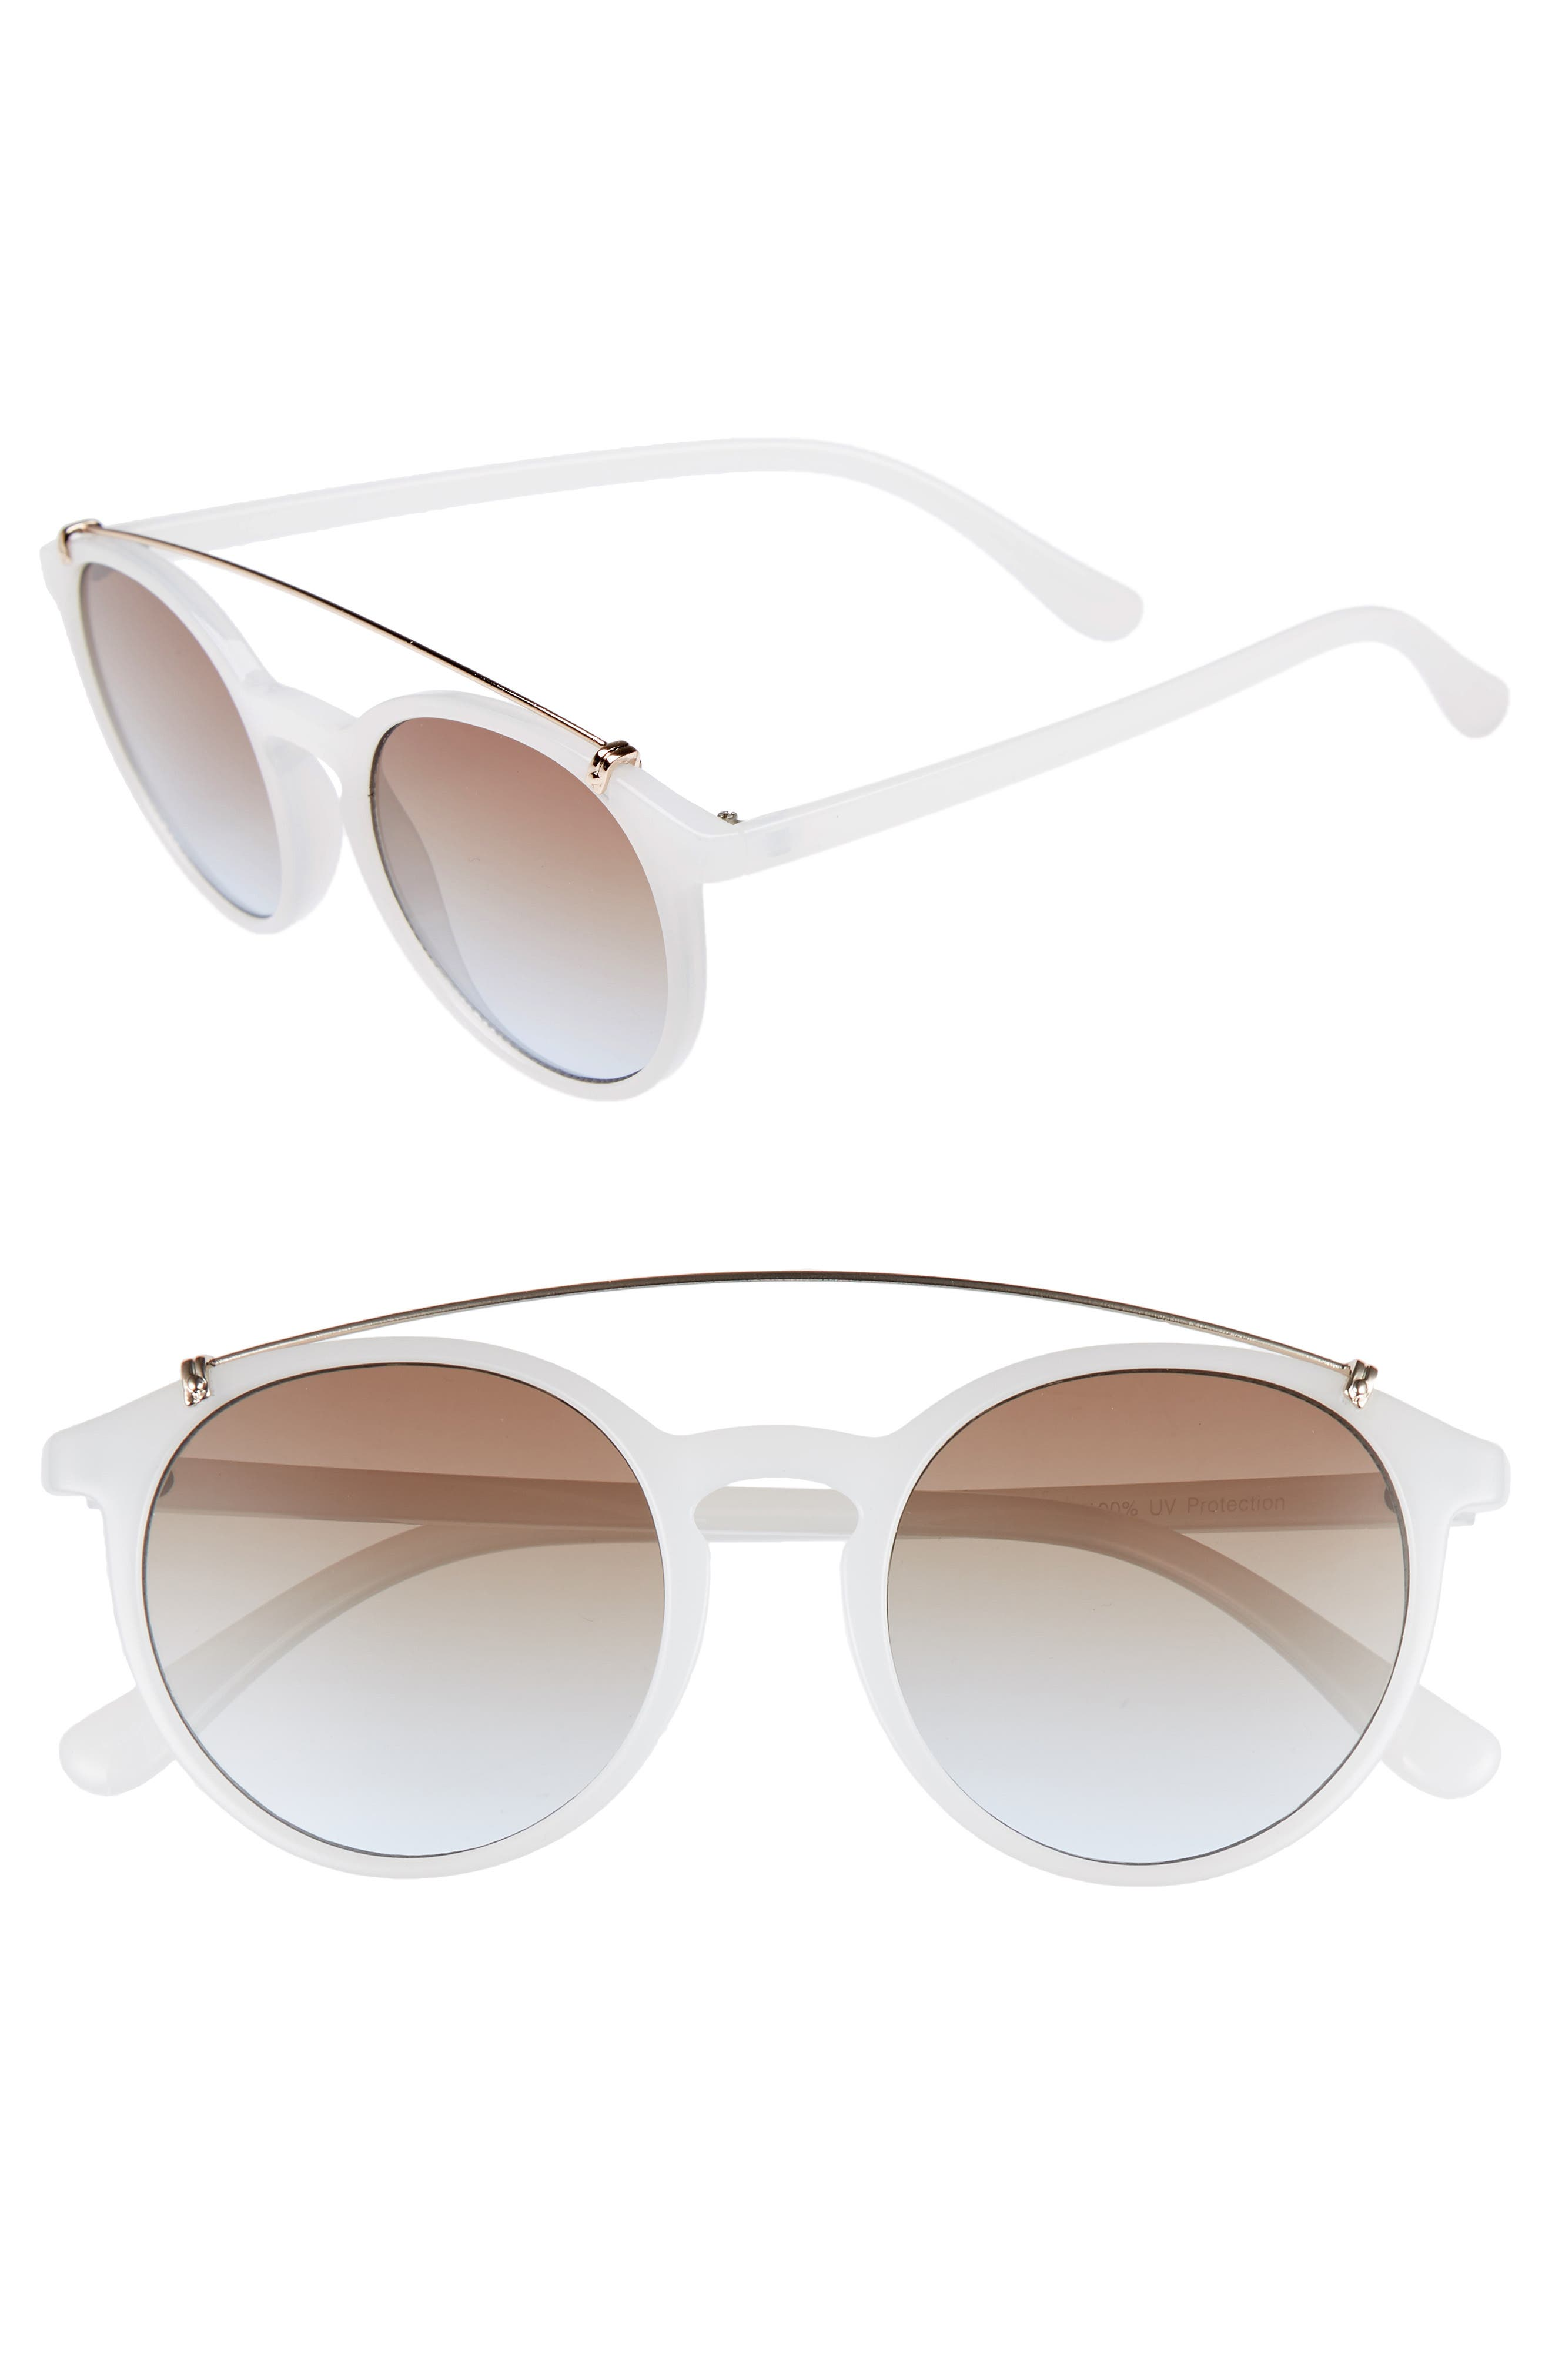 Round Aviator Sunglasses,                         Main,                         color, MILKY WHITE/ GOLD